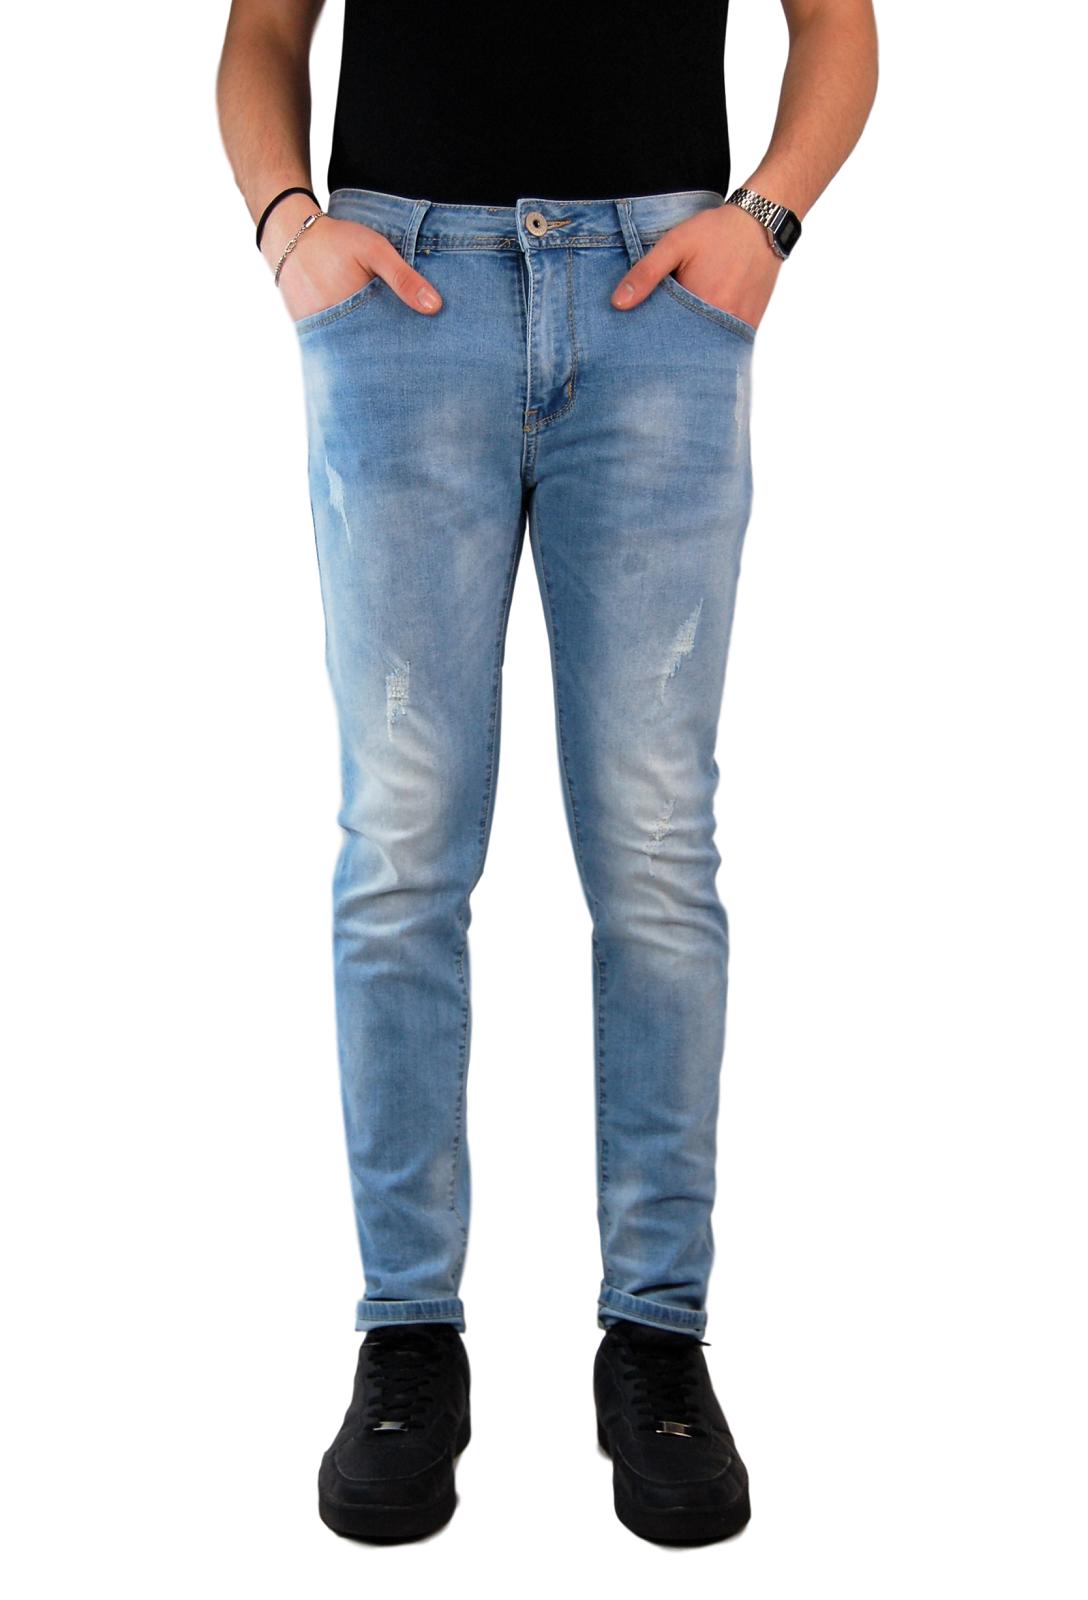 Jeans-Uomo-Slim-fit-Strappati-Pantaloni-Elasticizzati-Casual-Denim-Blu miniatura 12